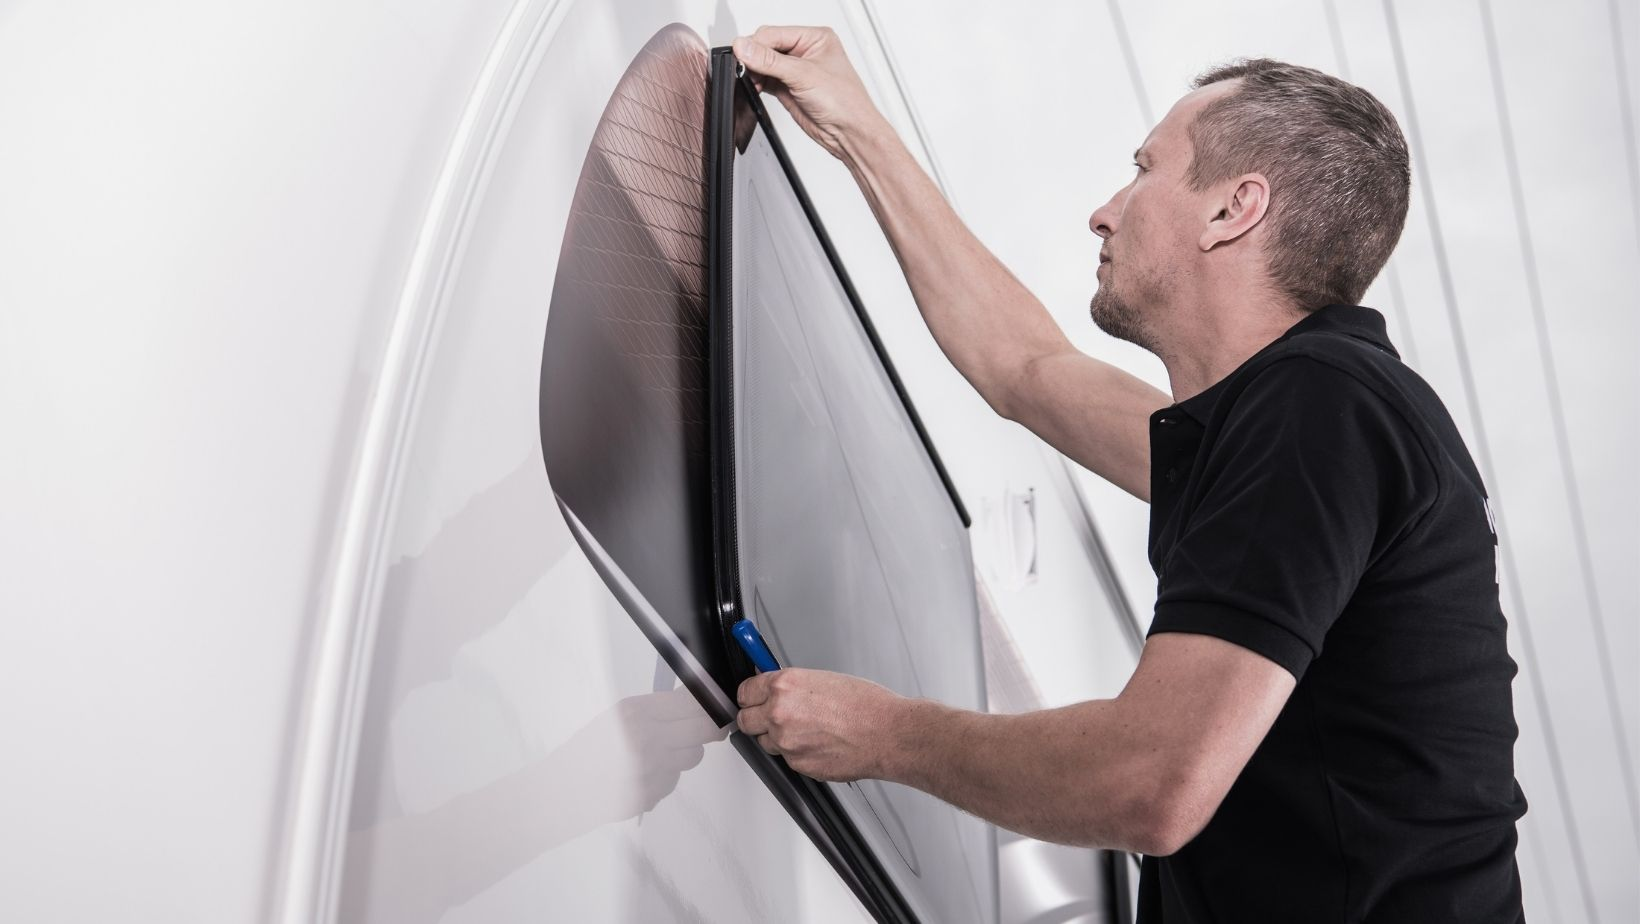 Man repairing seal on RV window